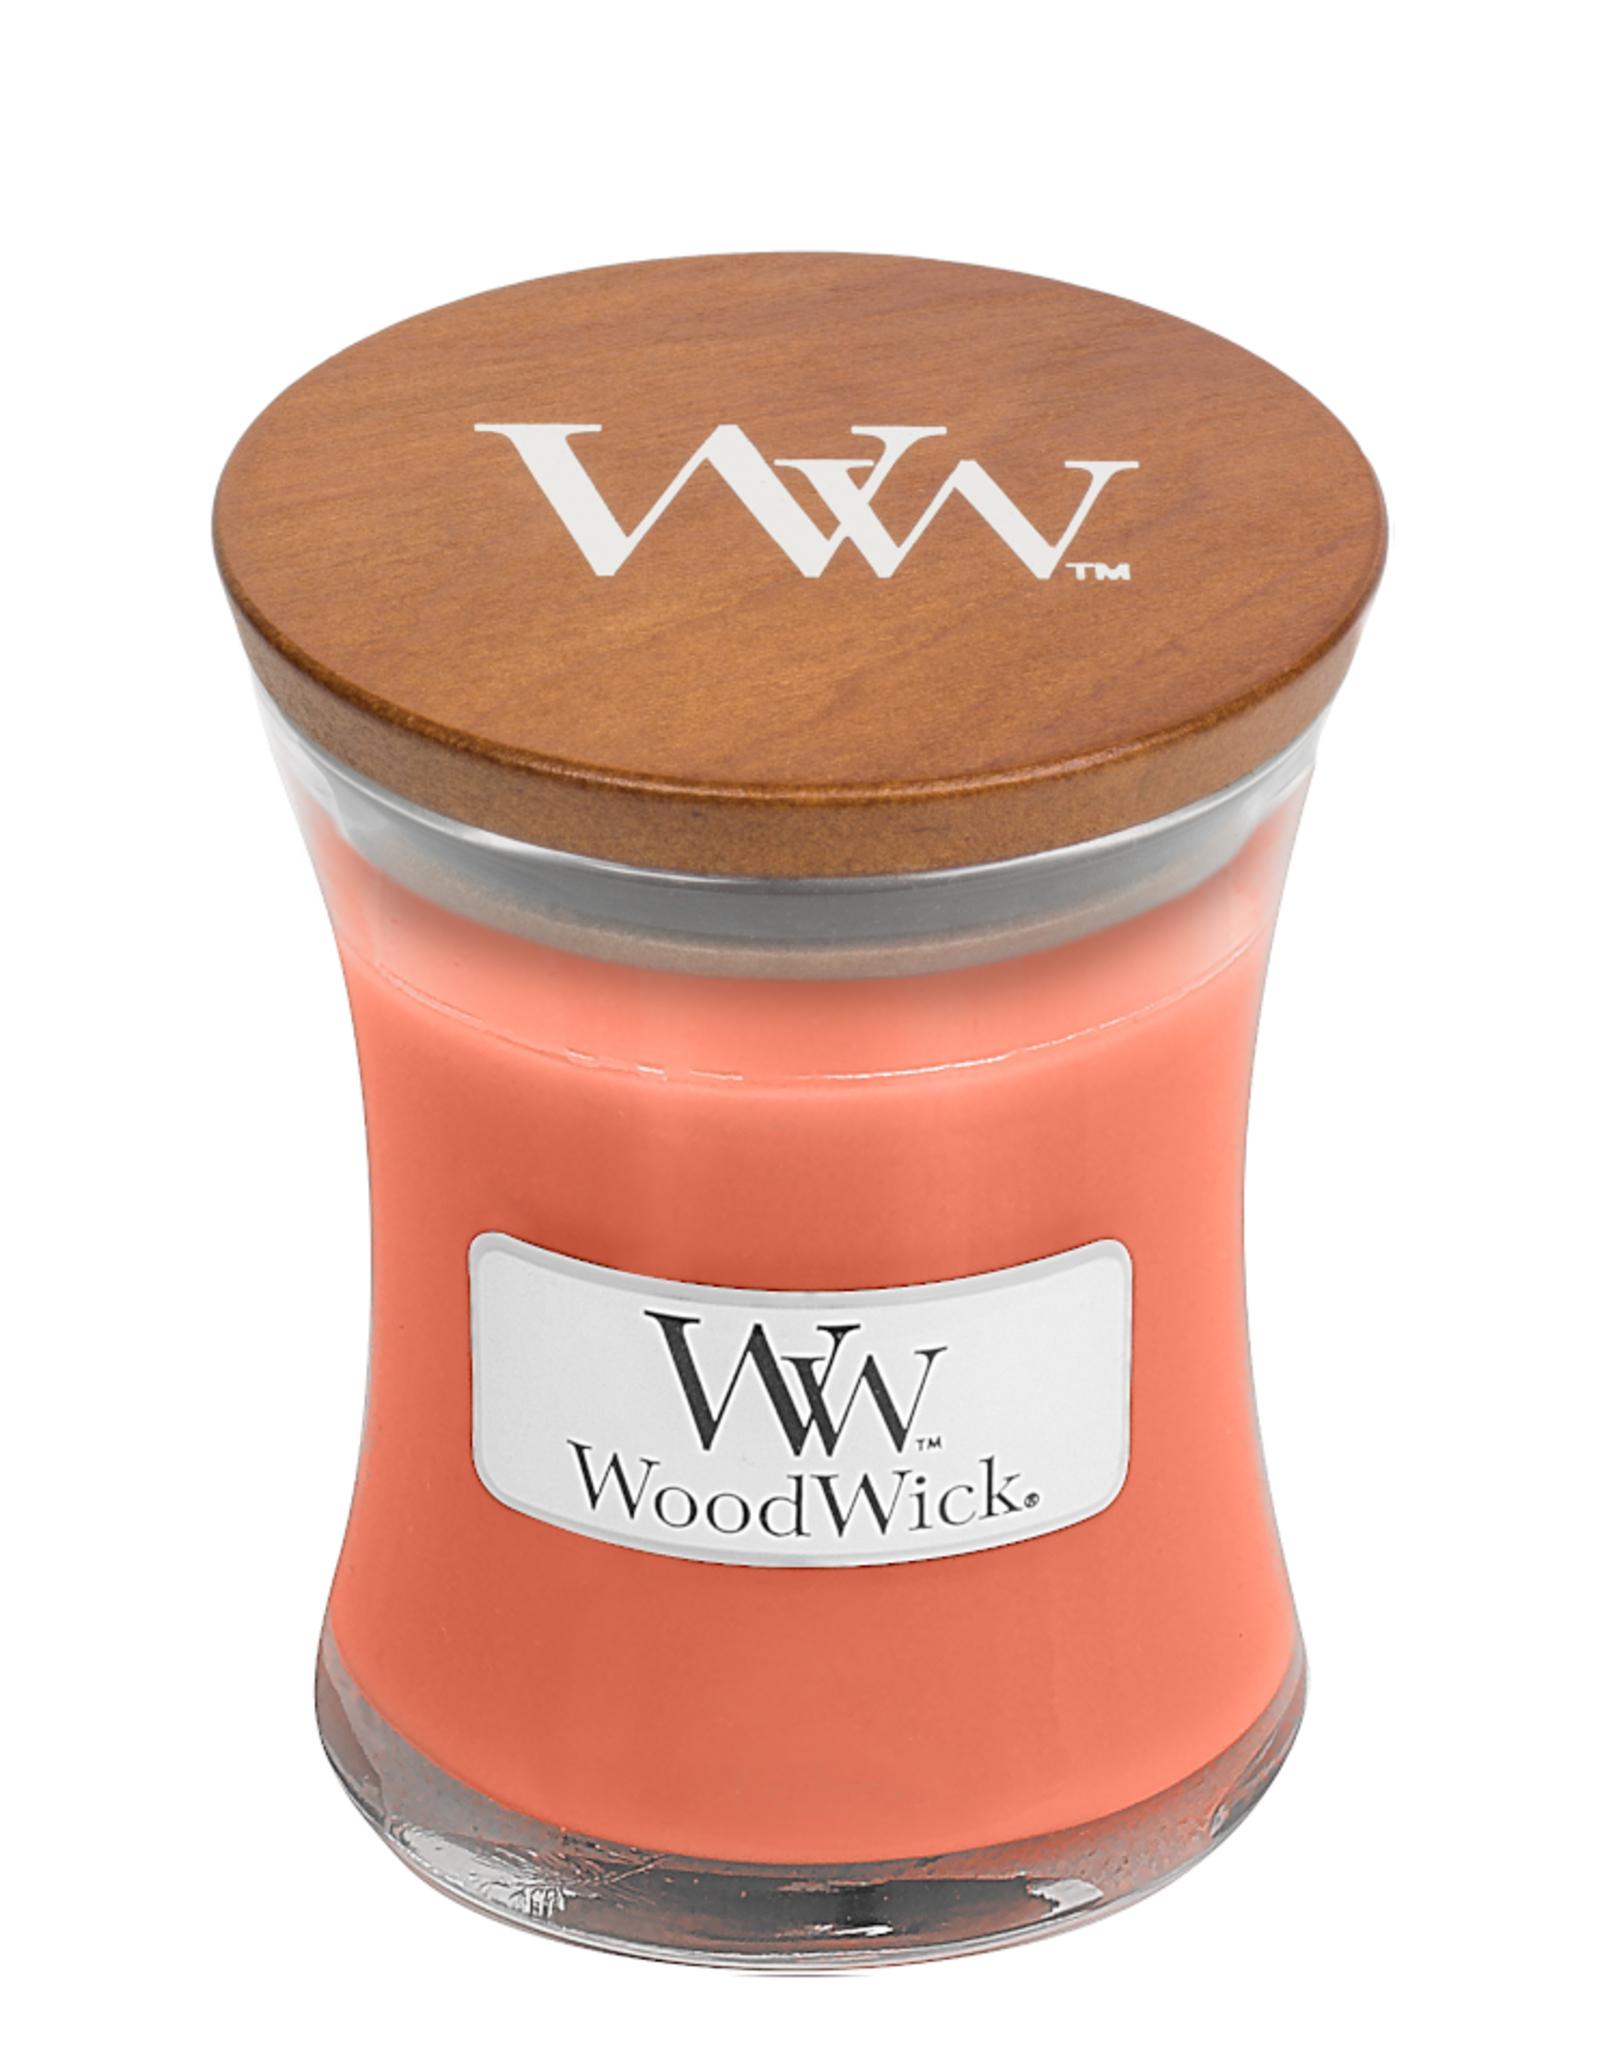 "WoodWick Kaars WoodWick ""Tamarind & Stonefruit"" mini - WoodWick"